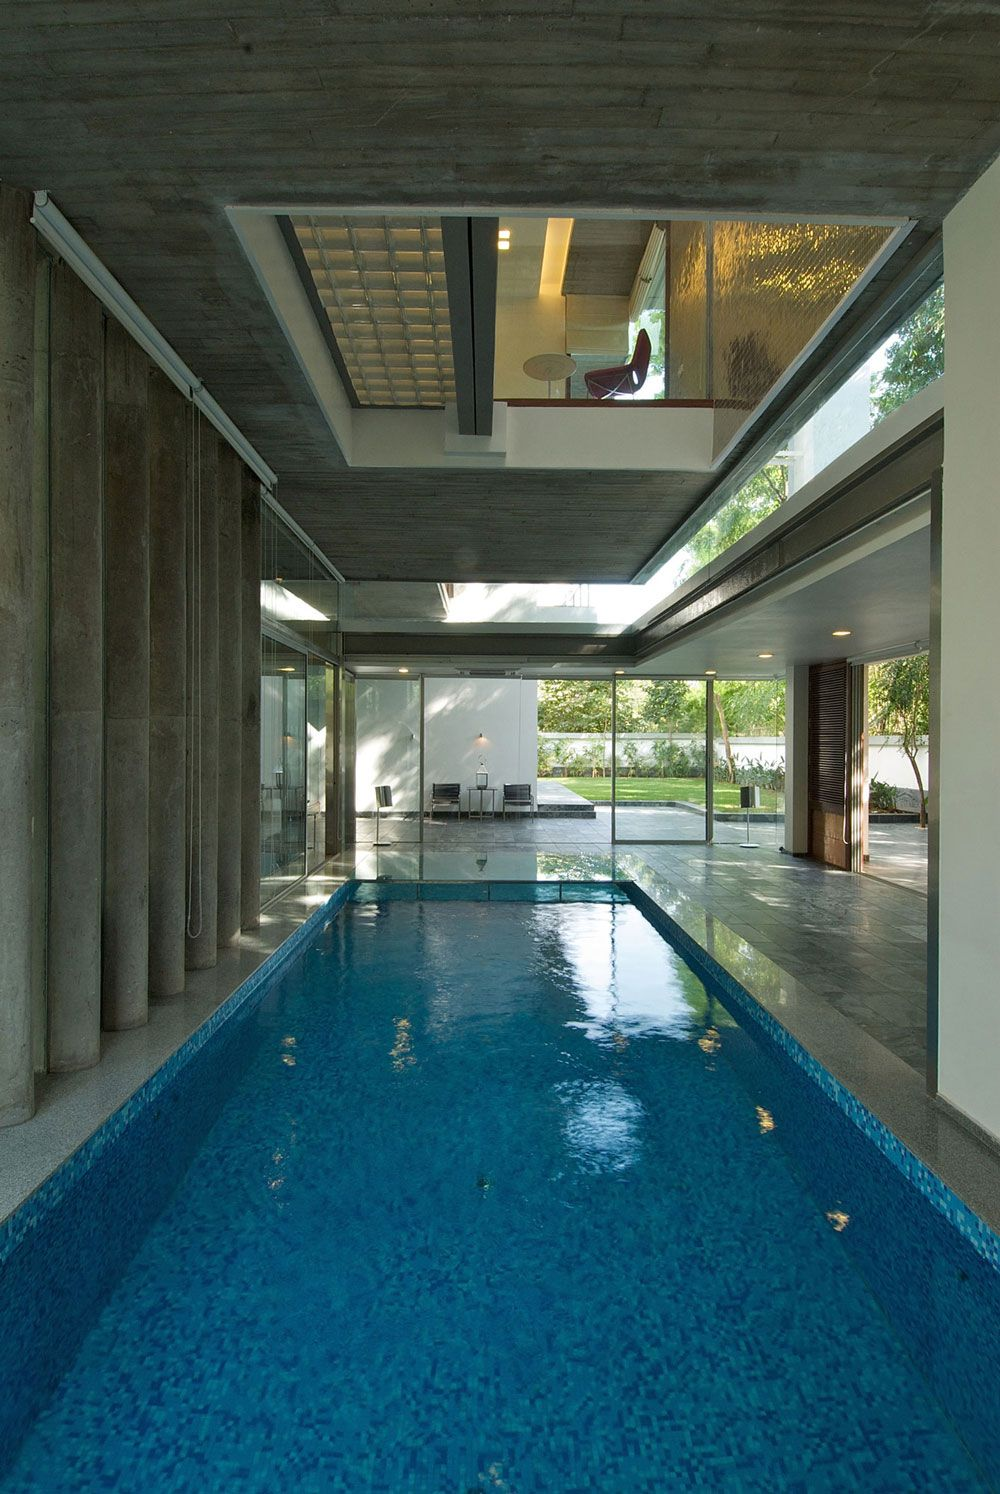 Poona House In Mumbai India By Rajiv Saini Luxury Swimming